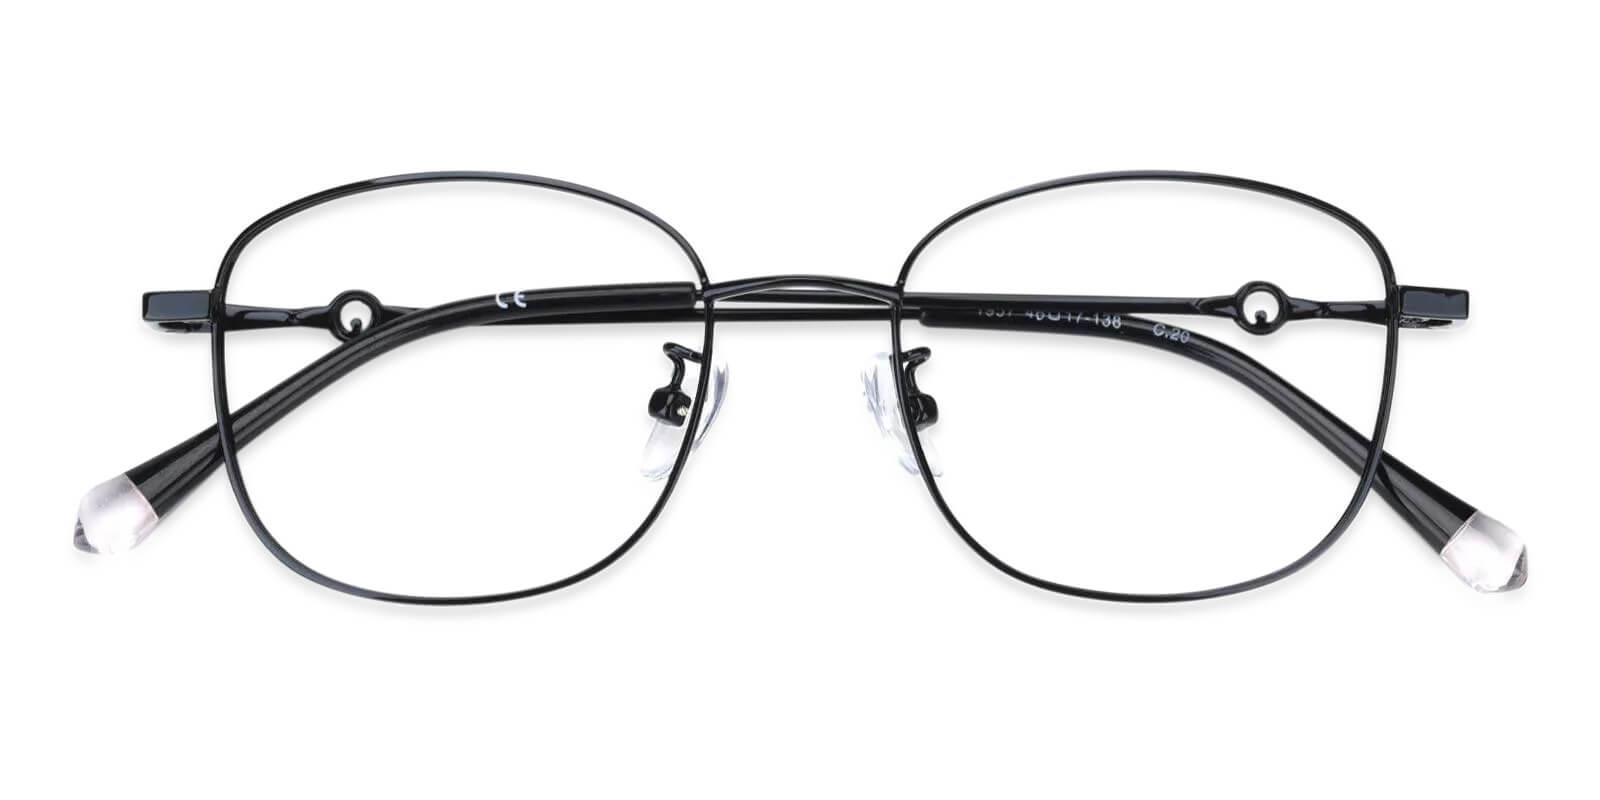 Defeny Black Metal Eyeglasses , Fashion , NosePads Frames from ABBE Glasses